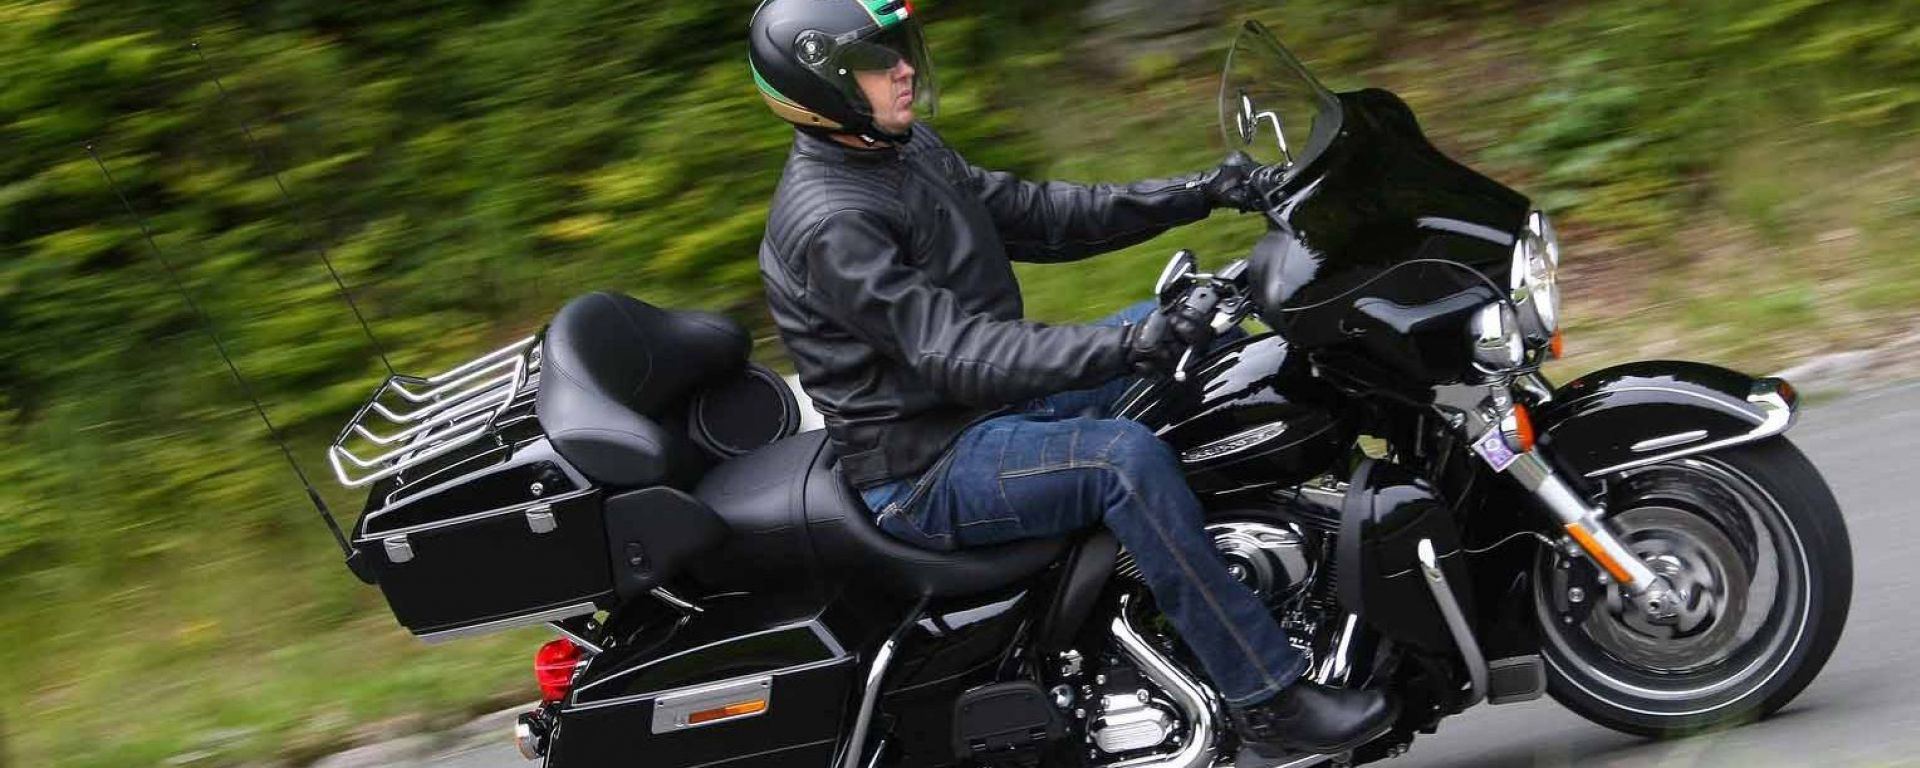 Harley Davidson MY 2011